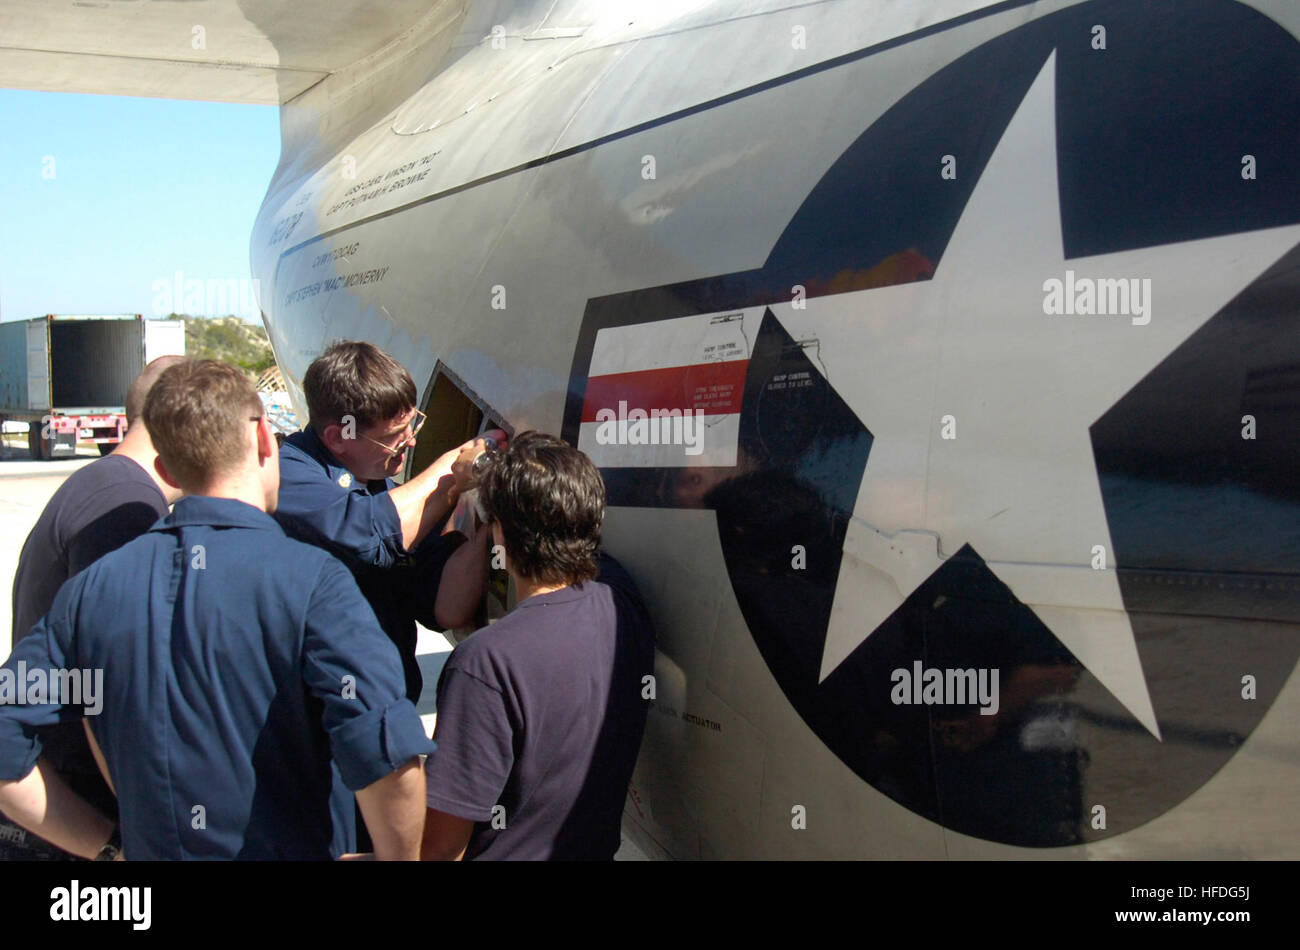 GUANTANAMO BAY, Cuba – Navy Chief Petty Officer Robert Hofman repairs a ramp lock actuator bracket on a C-2 Greyhound Stock Photo